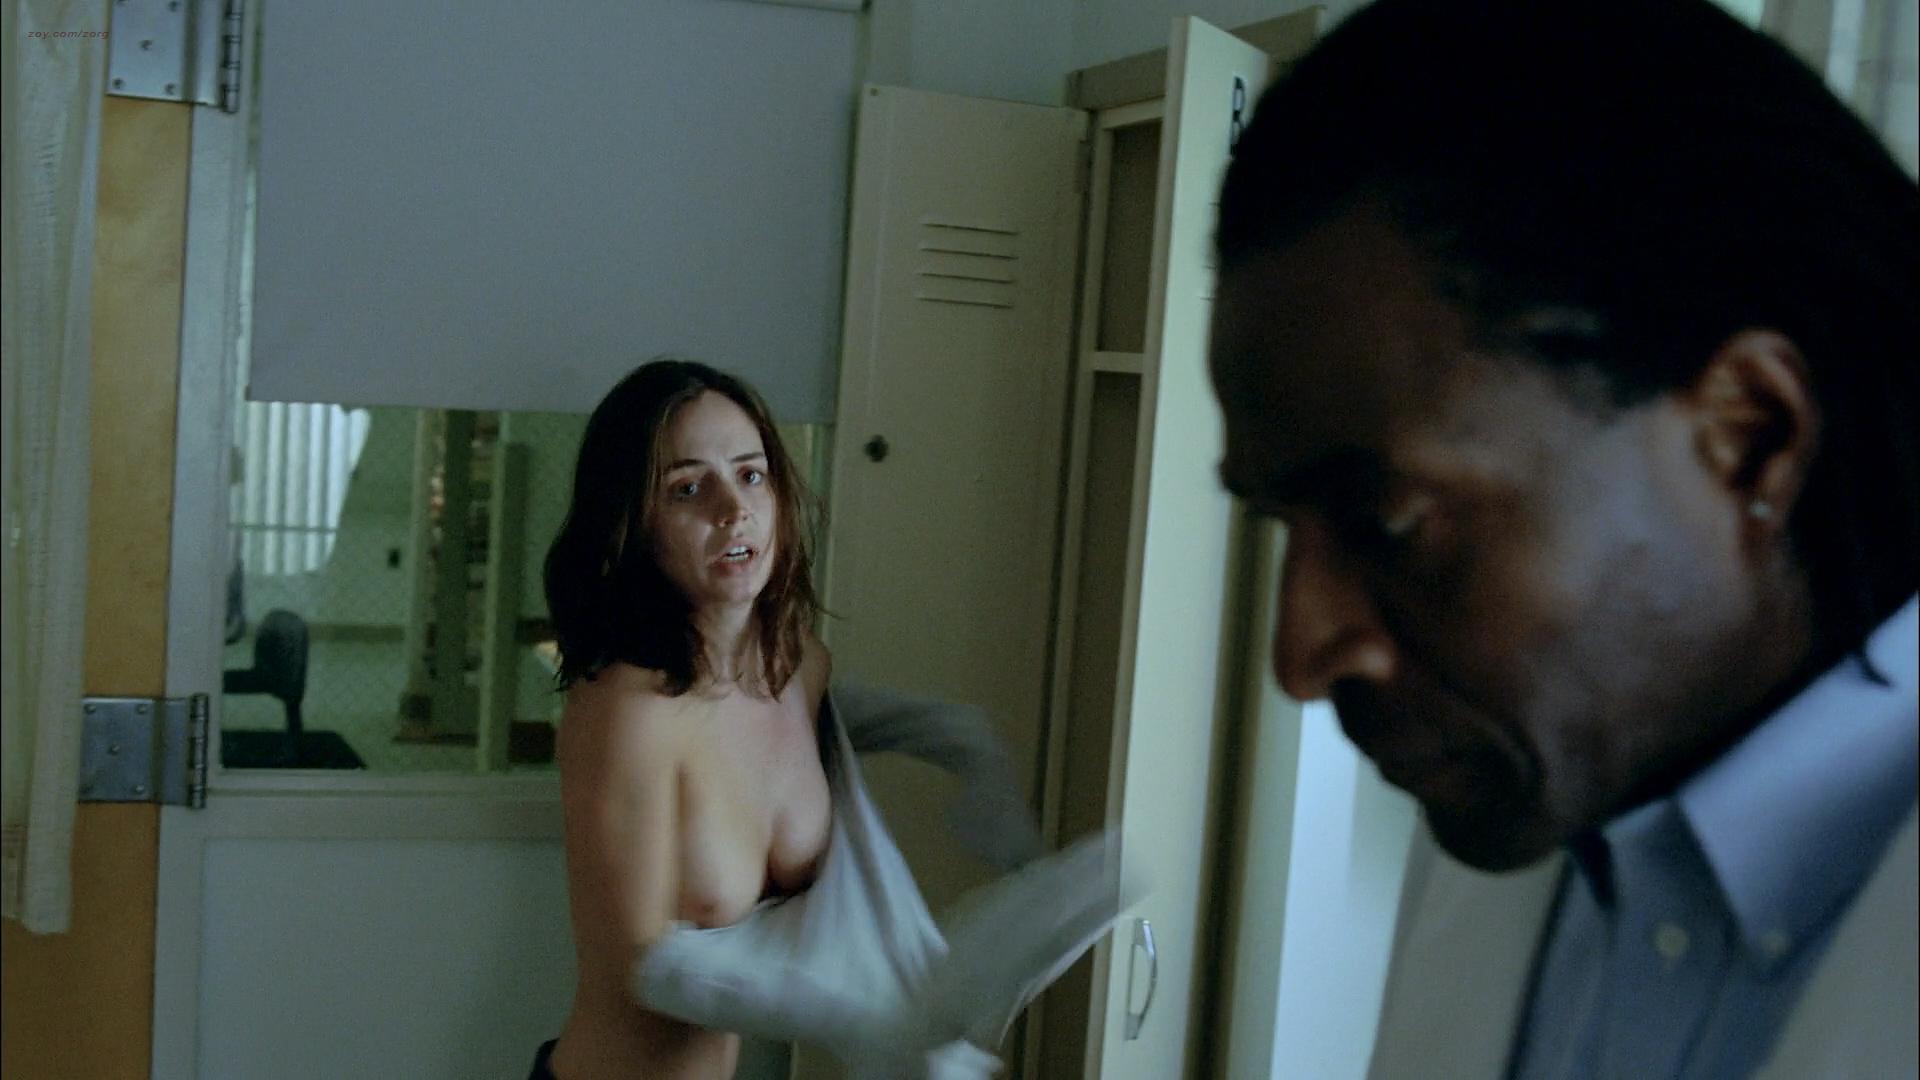 Eliza Dushku nude brief topless - The Alphabet Killer (2008) HD 1080p BluRay (10)